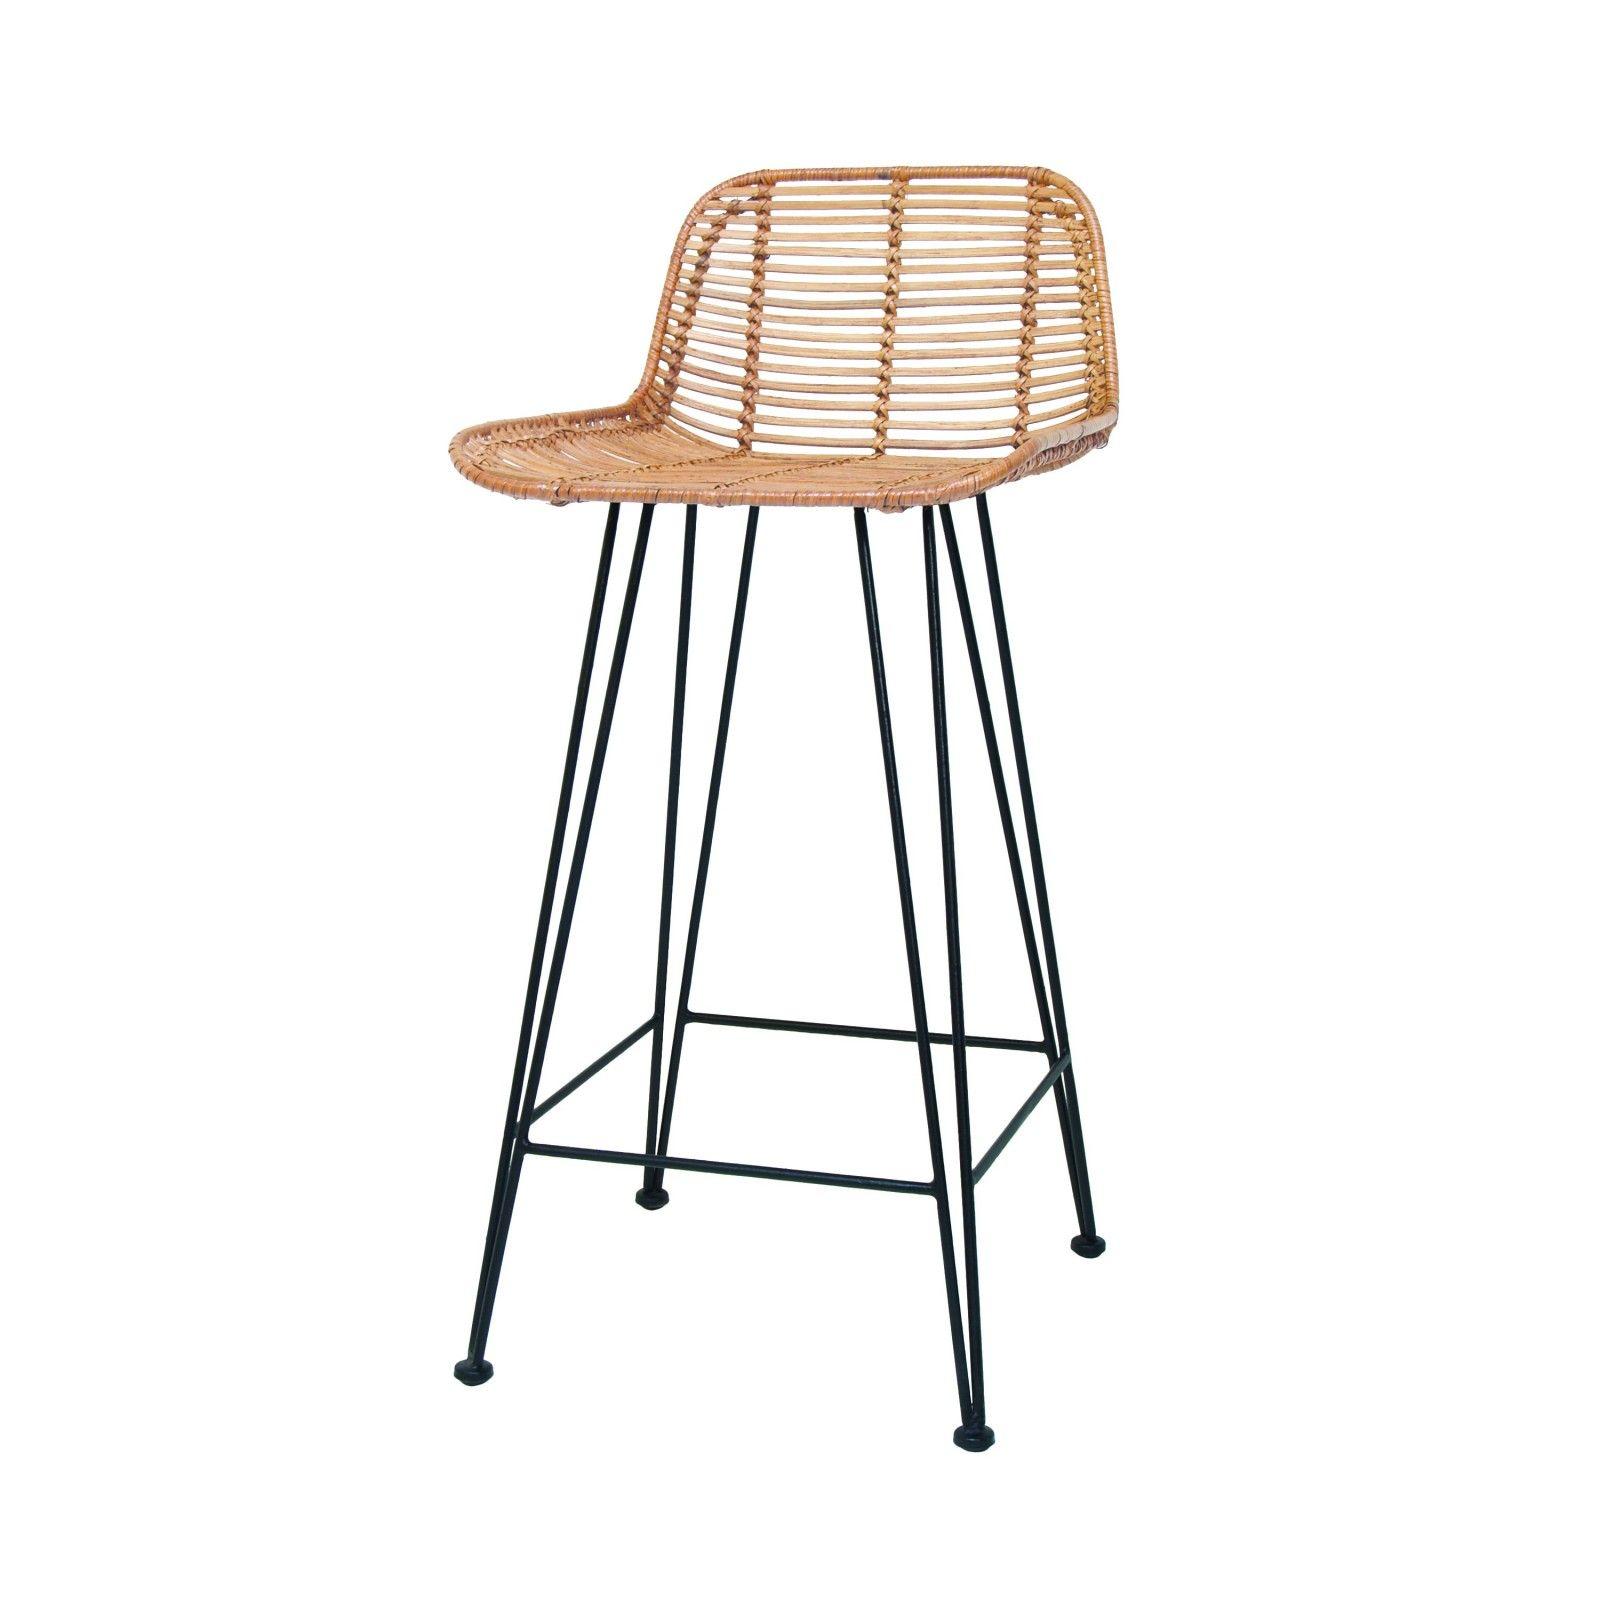 Barstuhl Rattan € 199 Inspiration Barhocker & stühle